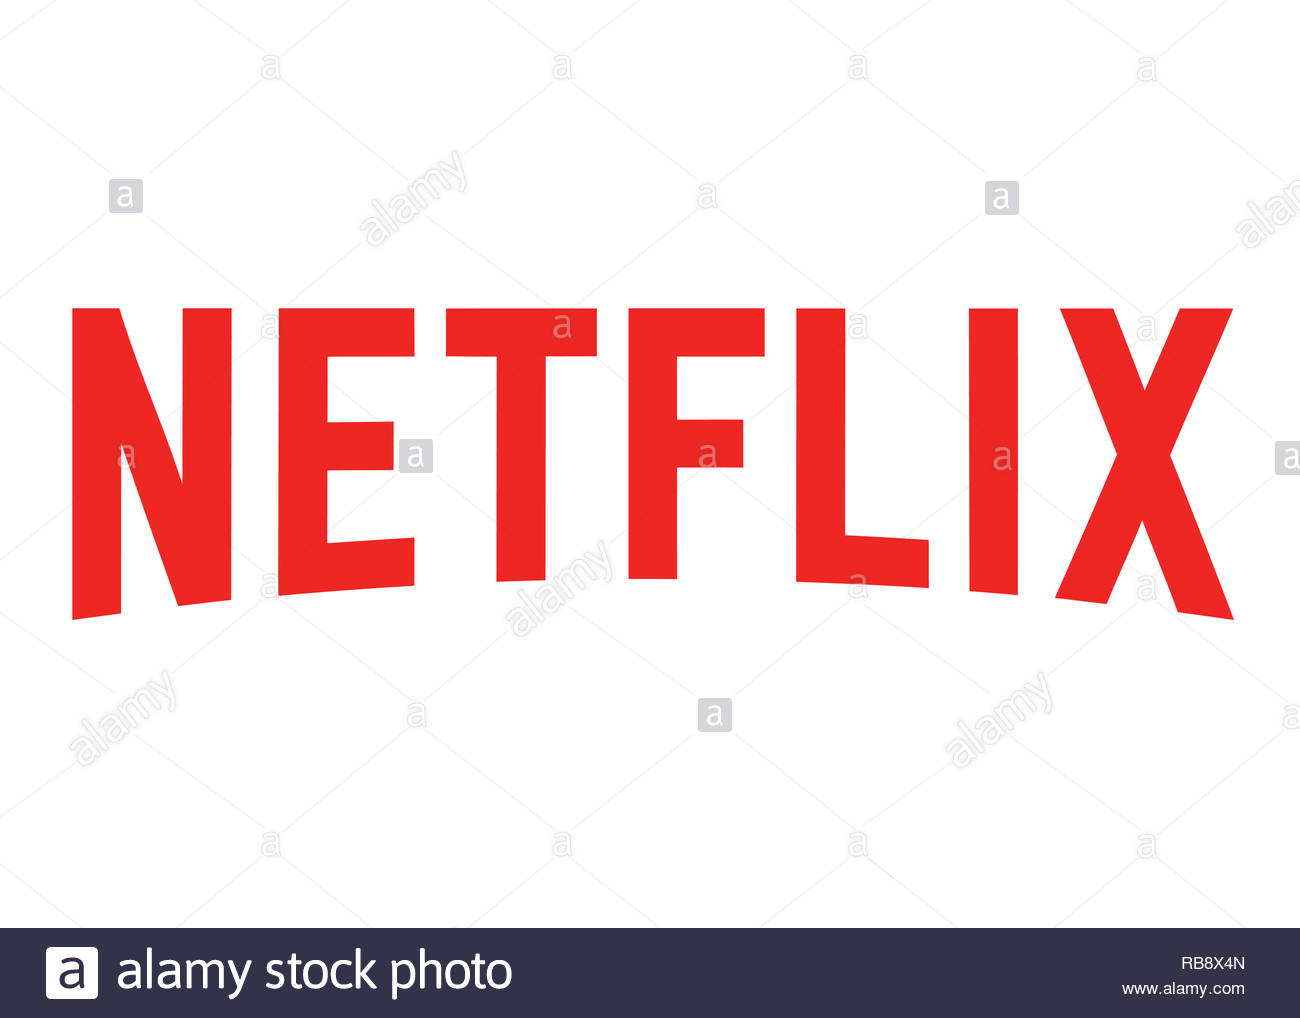 Netflix logo Stockbild